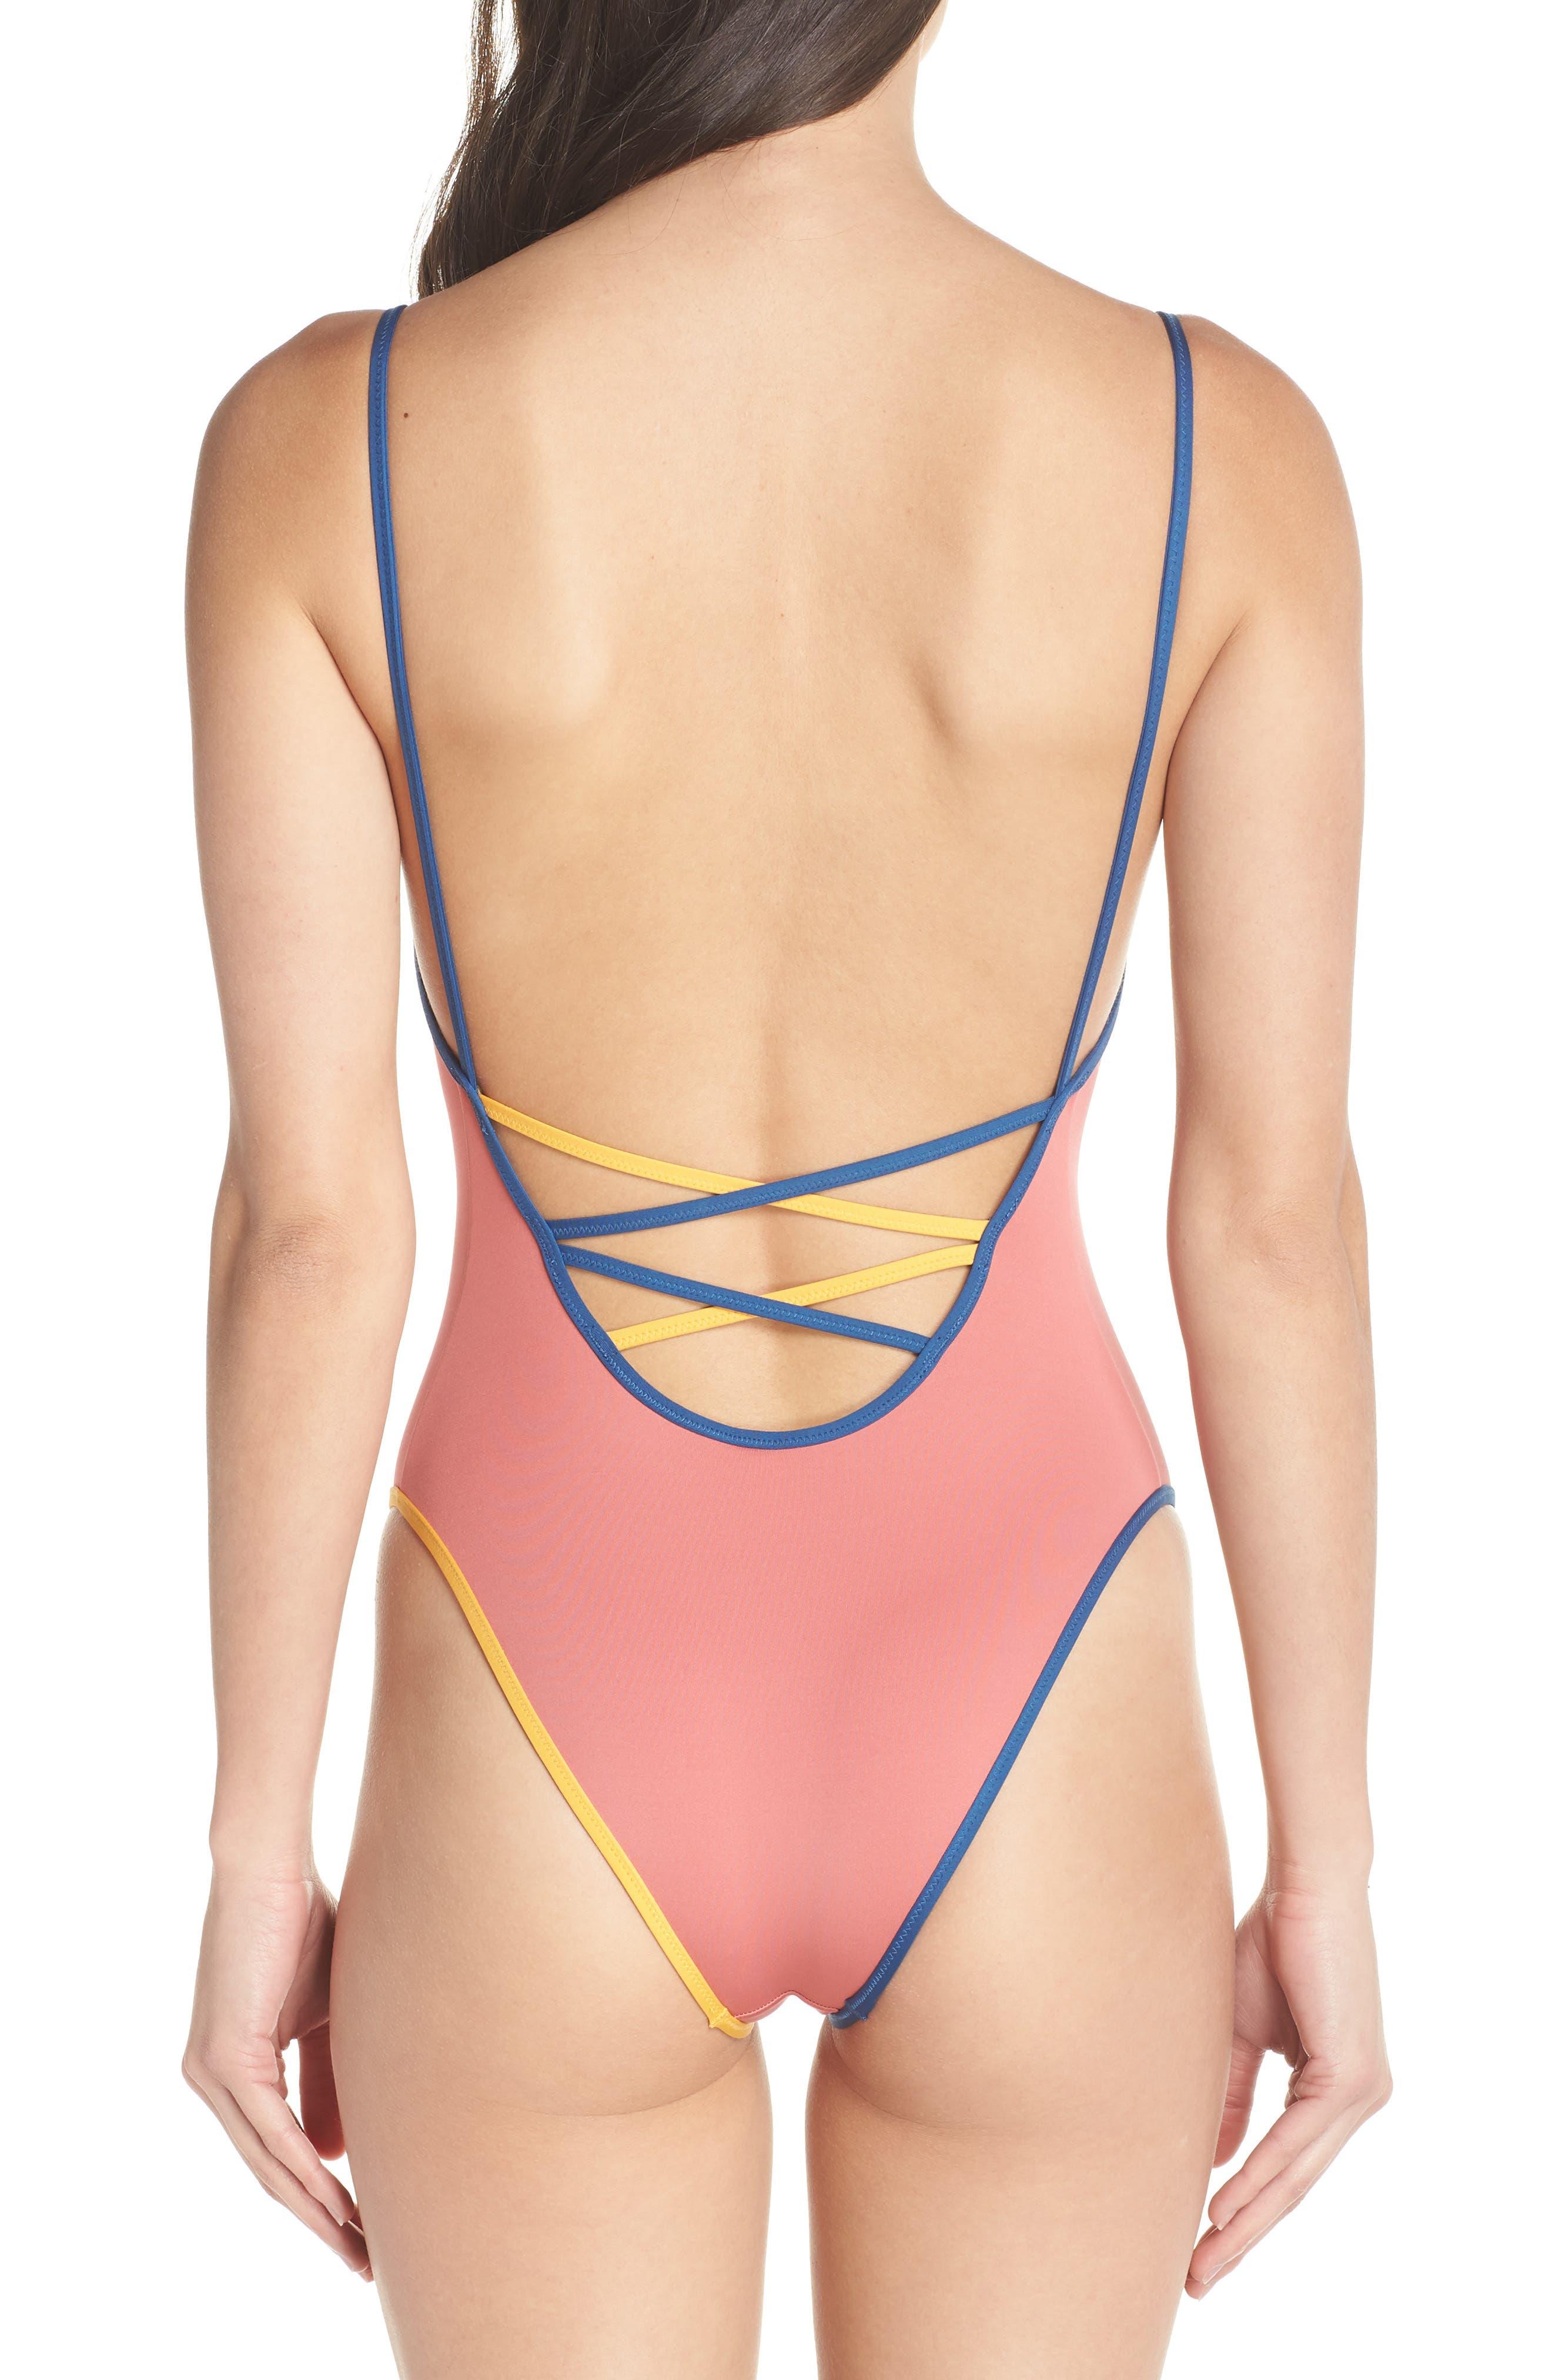 Playa Montauk Strappy One-Piece Swimsuit,                             Alternate thumbnail 2, color,                             Vintage Pink Multi